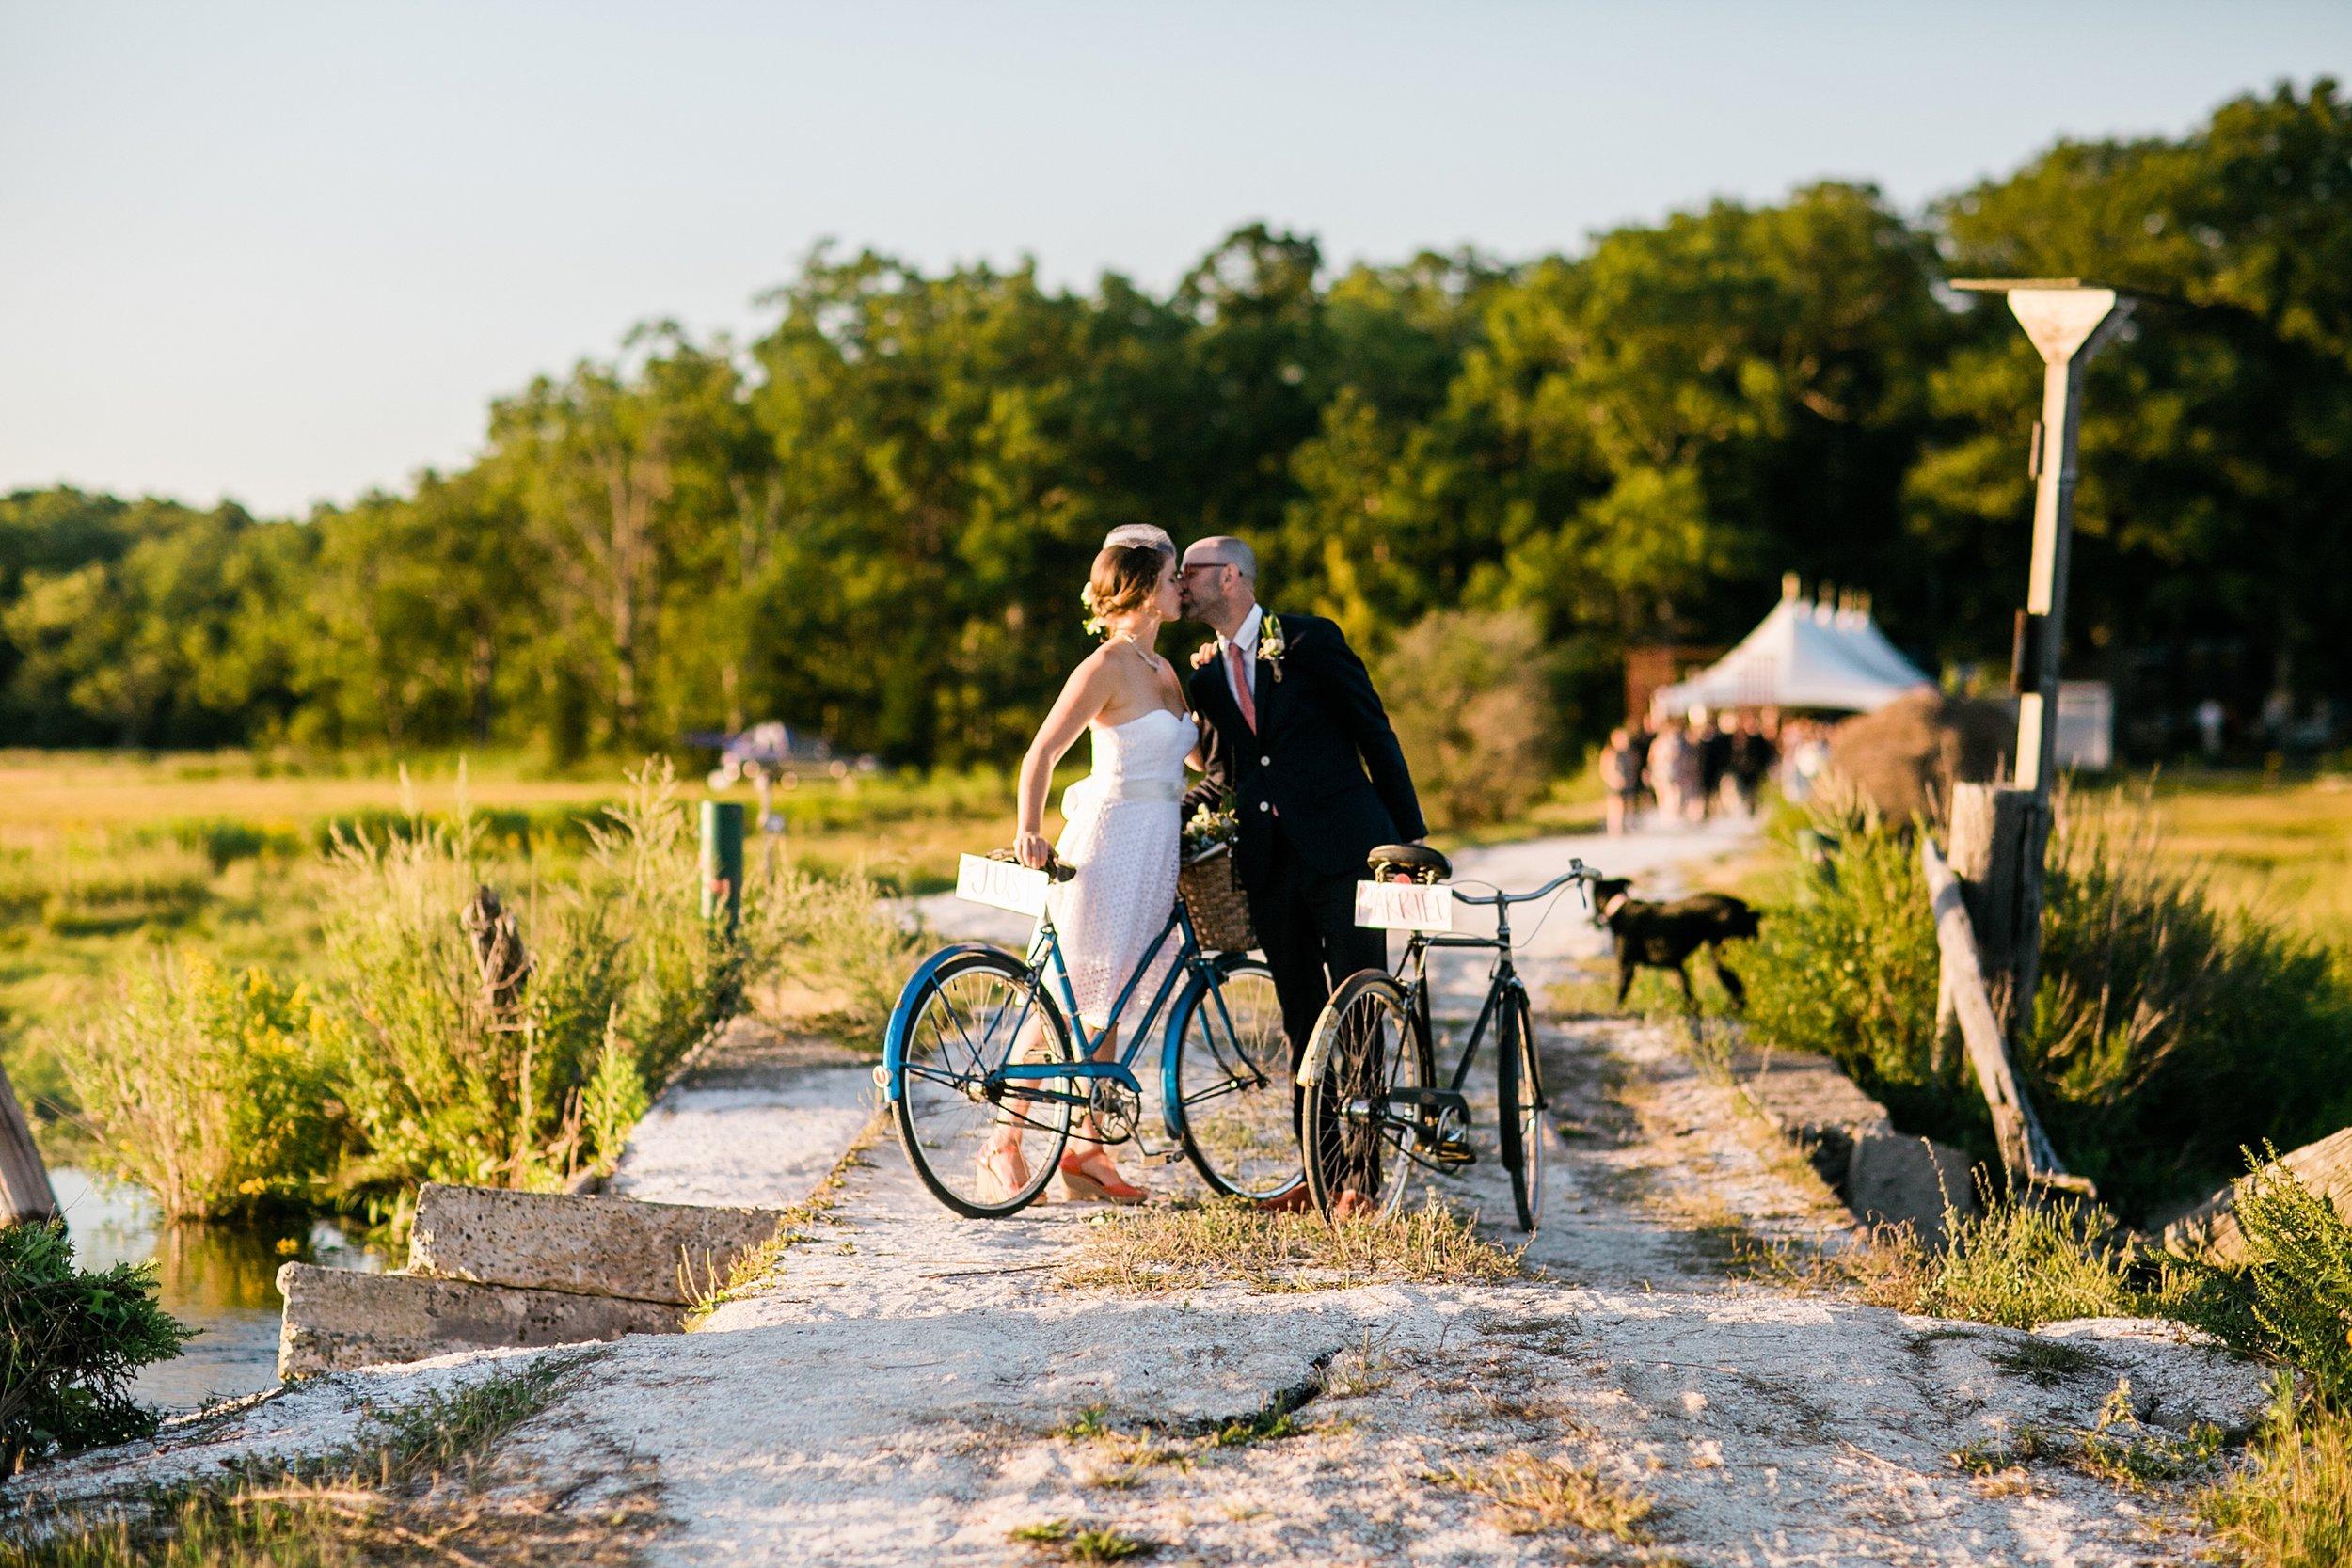 070 los angeles wedding photographer.jpg